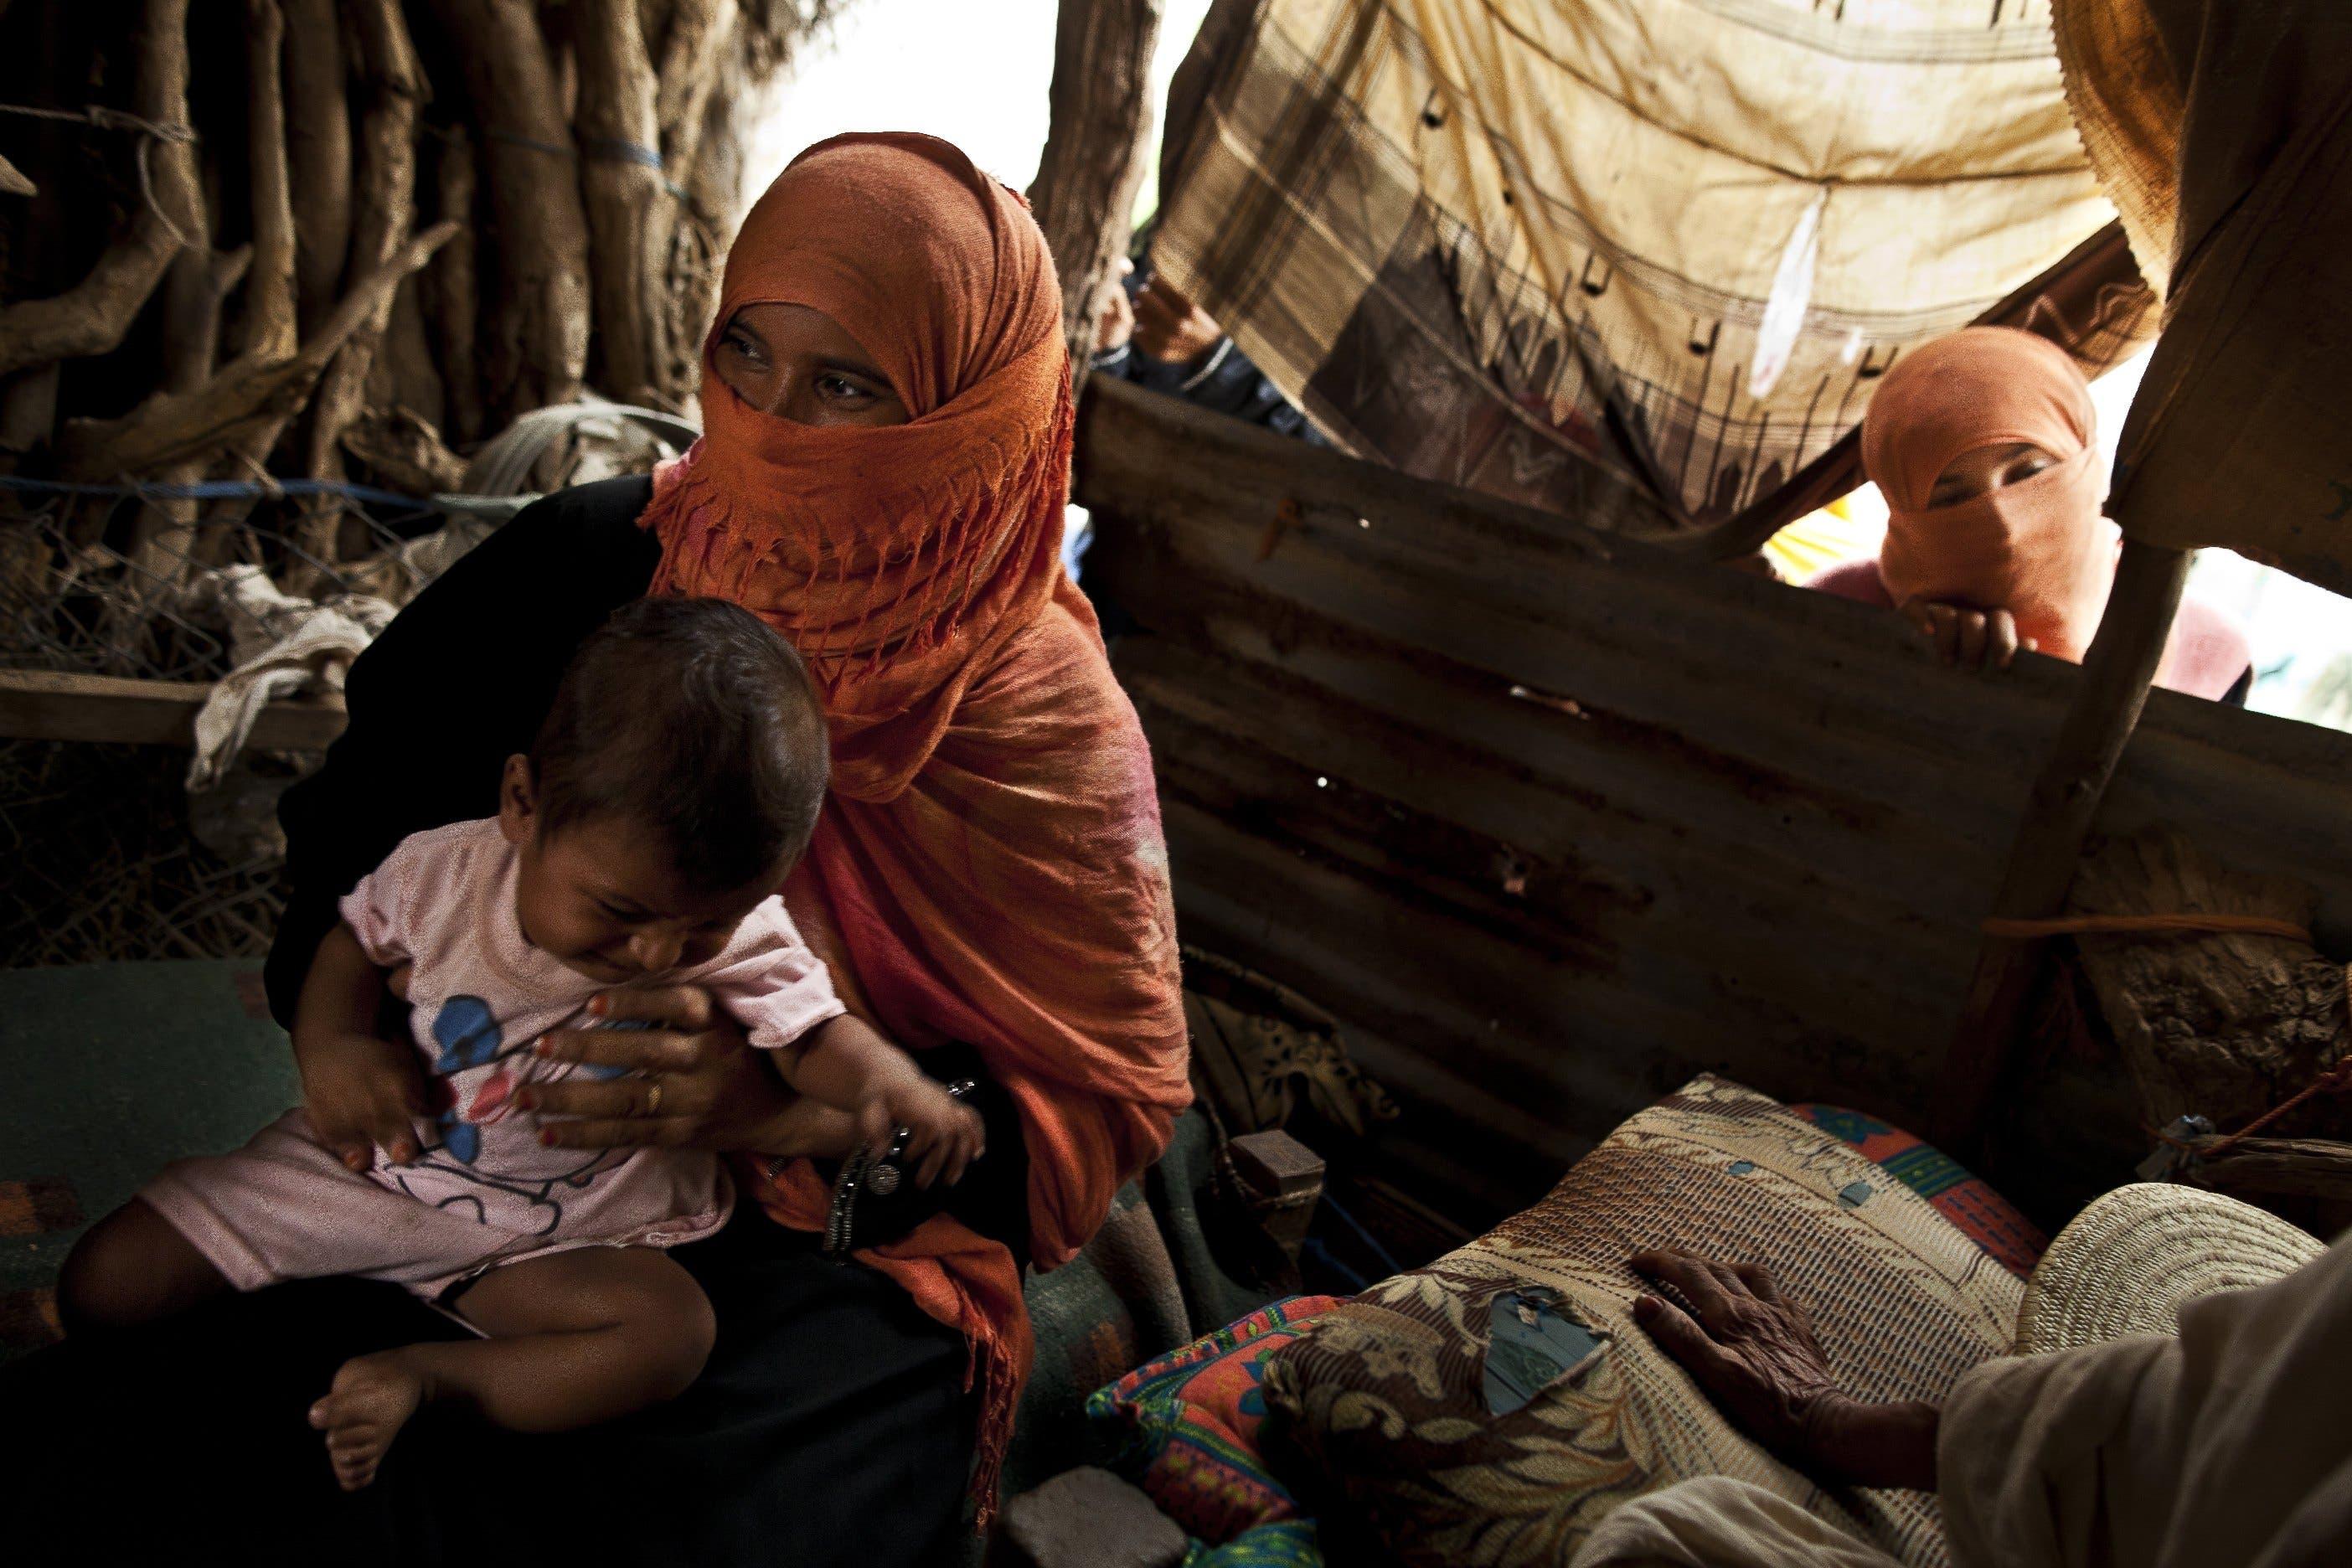 2 Yemeni women sharing a house